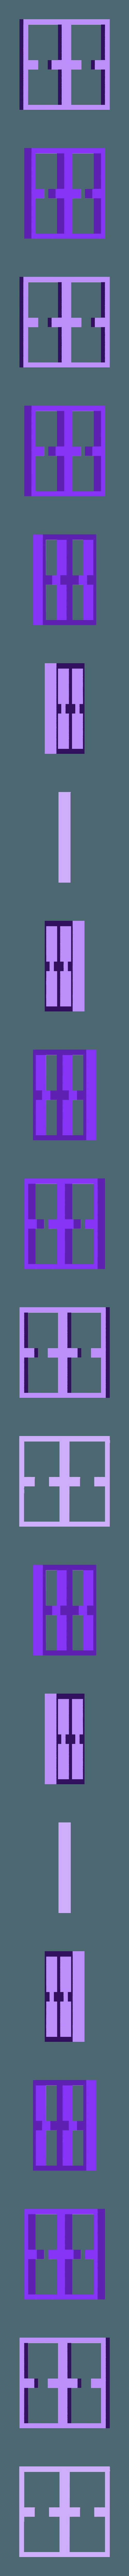 settler-box-full.stl Download free STL file Catan Card Game Inlay / Card Box • 3D printer design, plokr